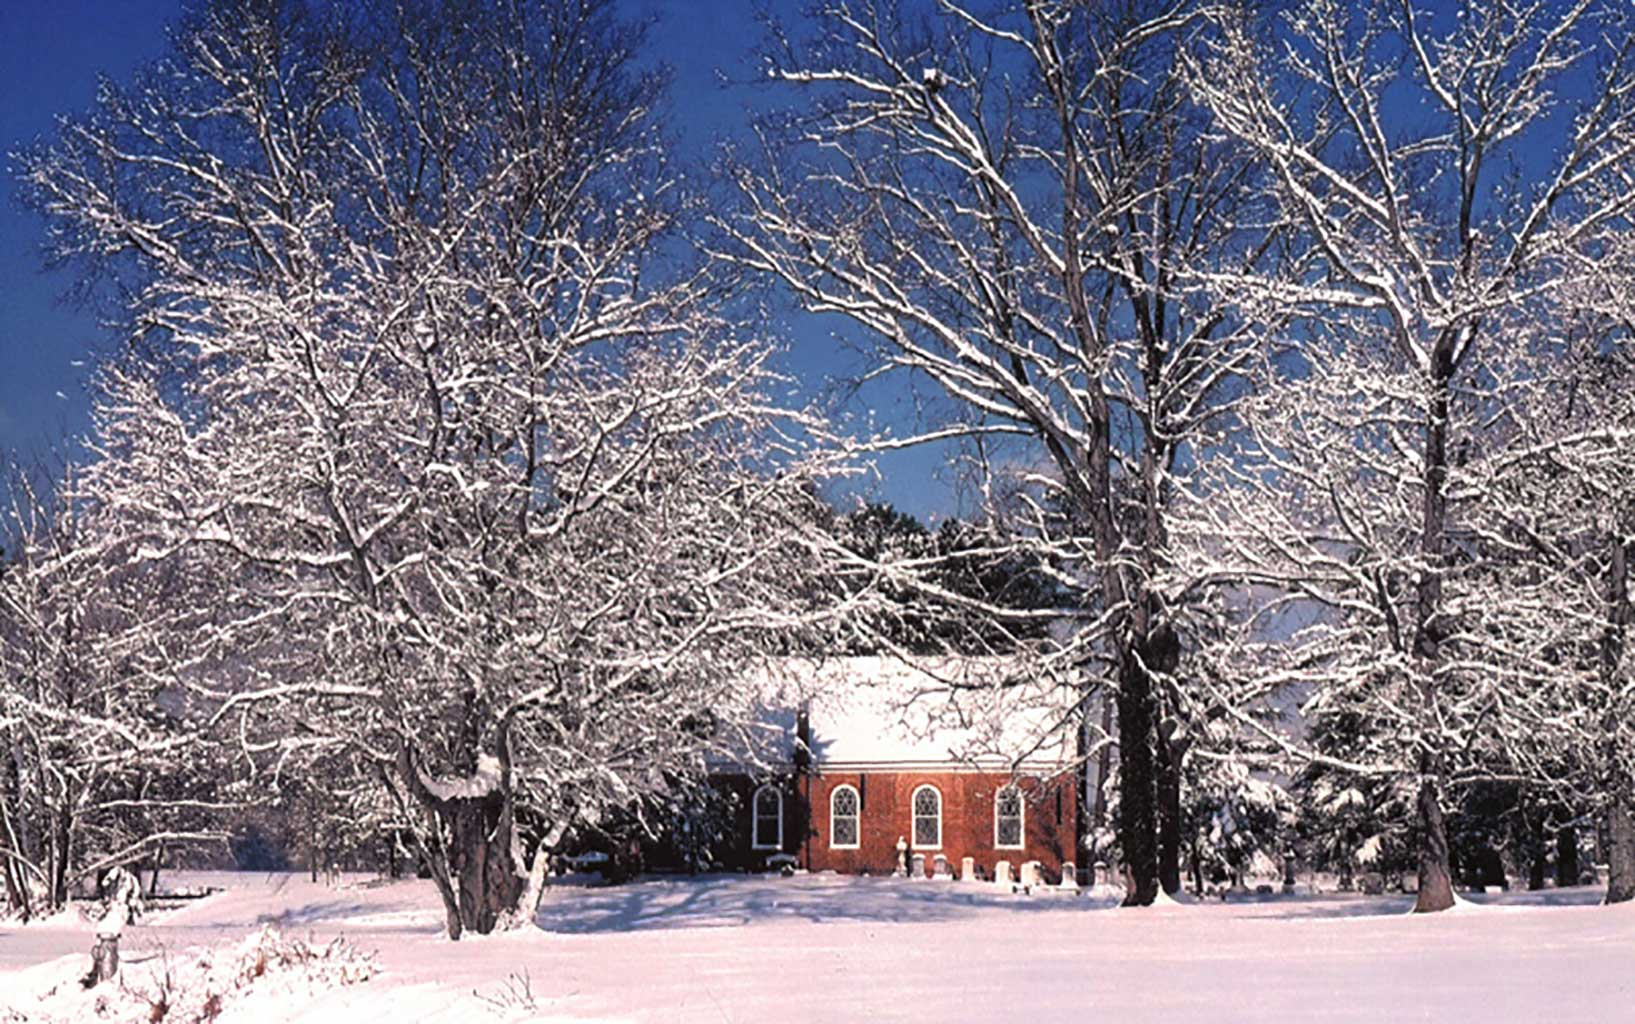 st-johns-church-snow-image1